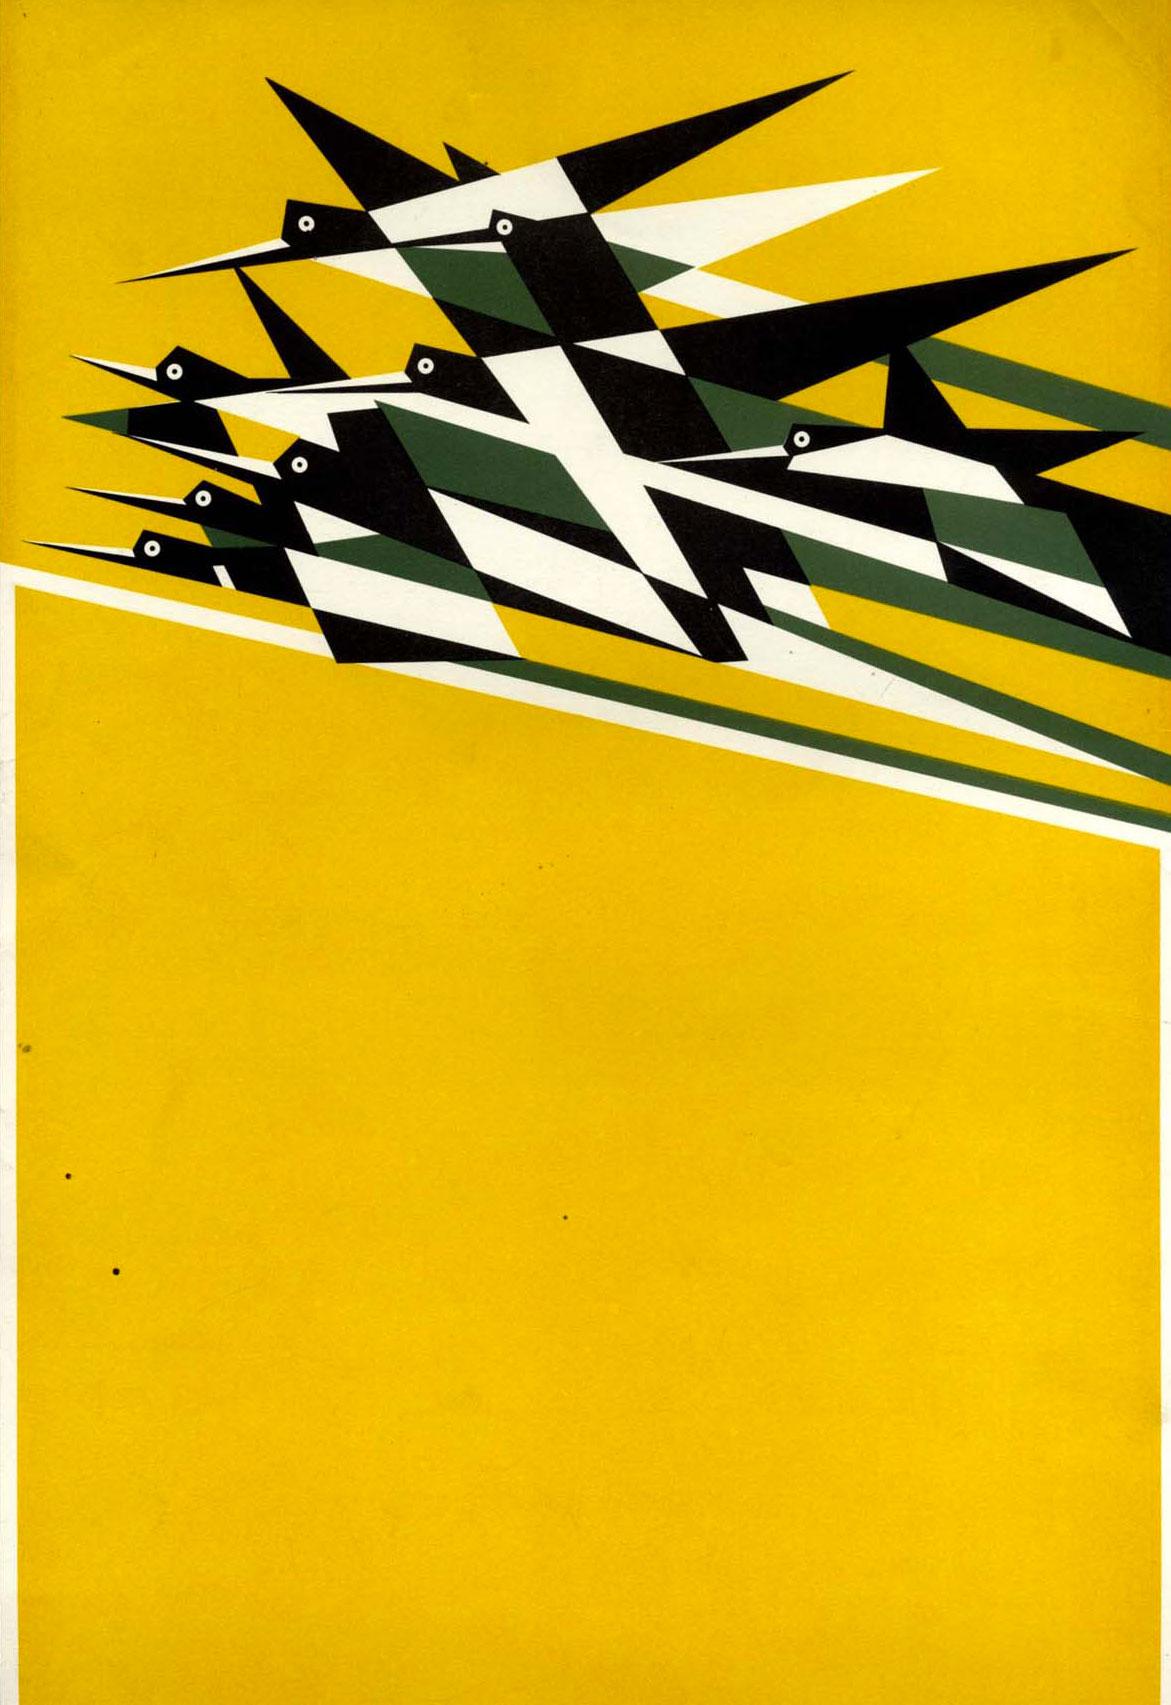 Edward-McKnight-Kauffer-affiche-Flight-Daily-Herald